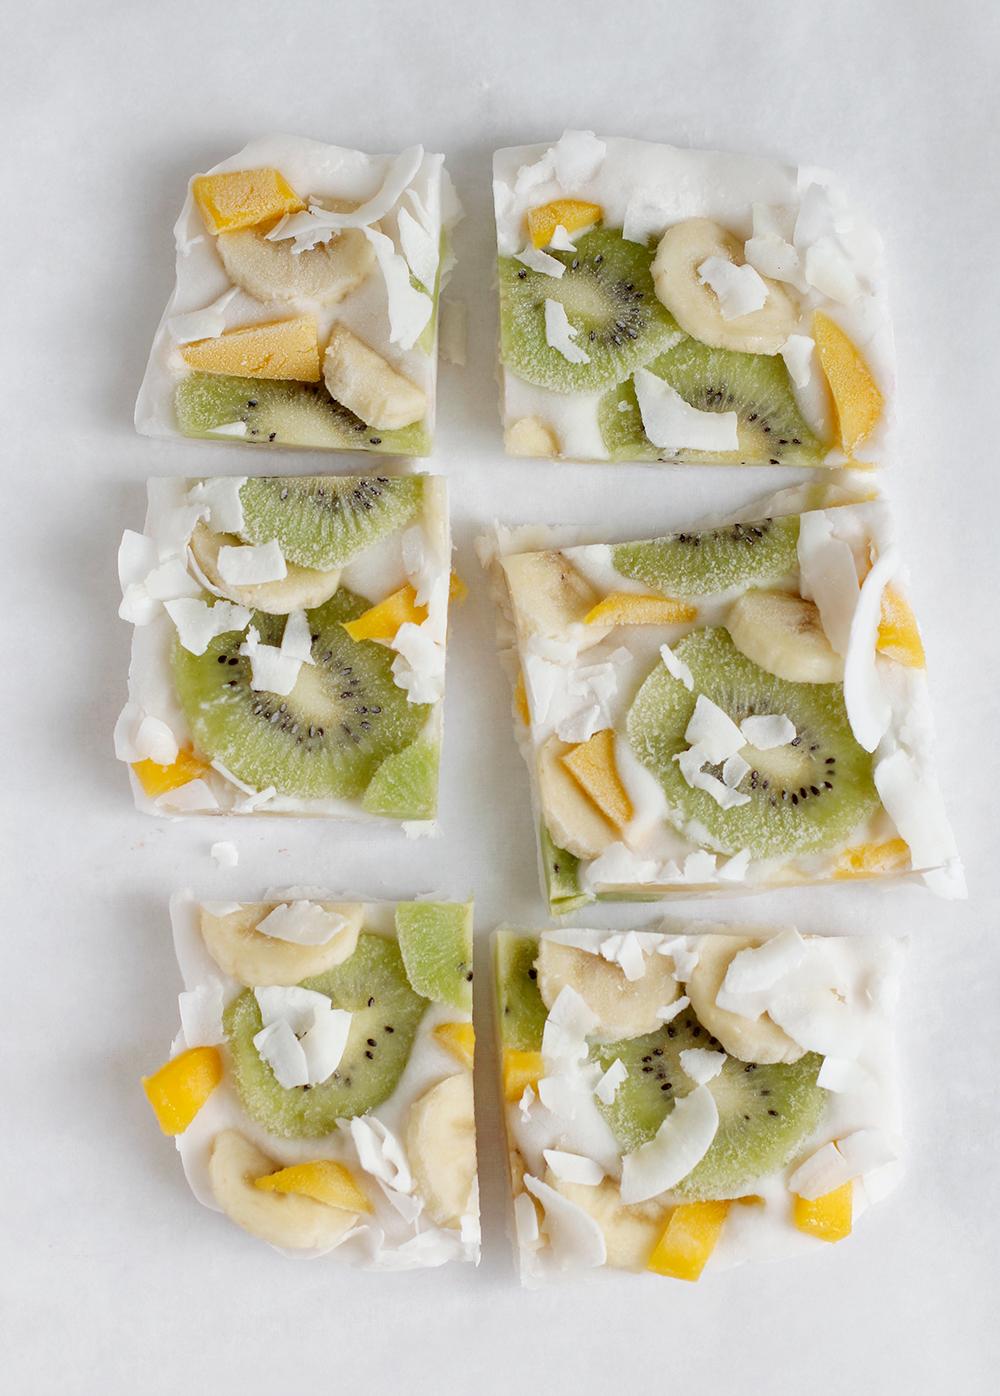 Rezept: Veganes Frozen Yogurt Bark vegan mit Mango, Kiwi, Banane und Kokos Chips | we love handmade